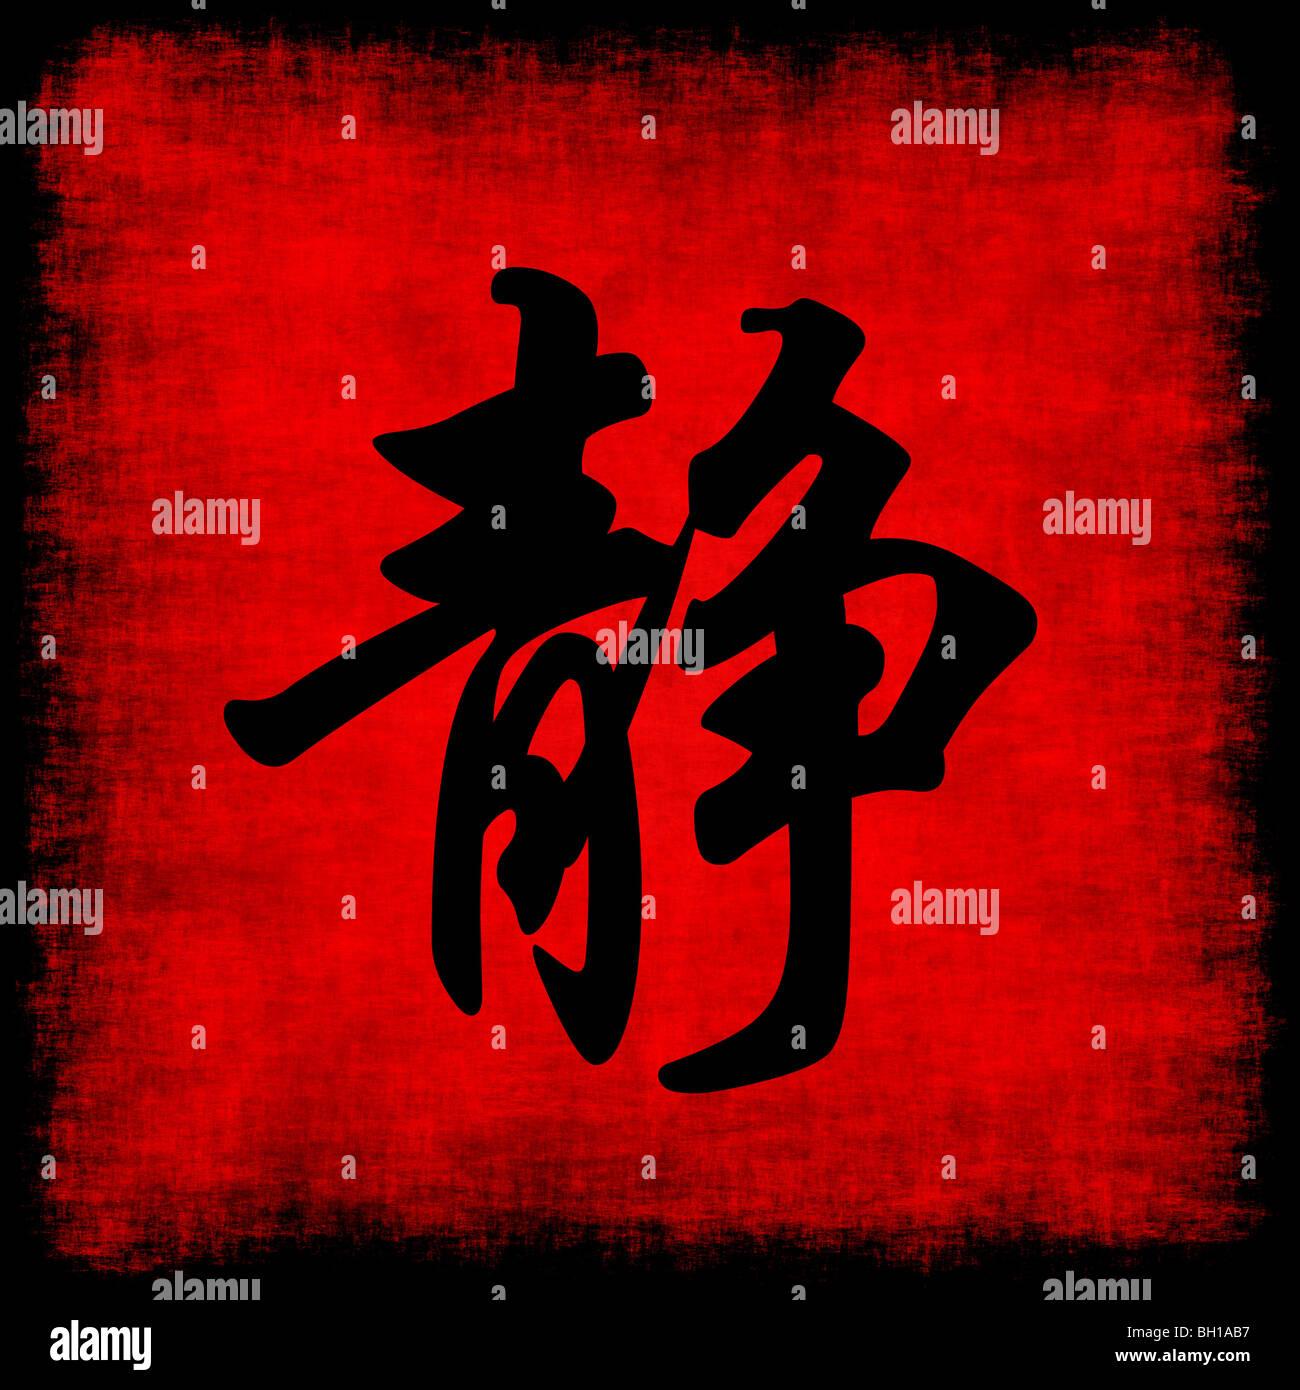 Serenity chinese calligraphy symbol grunge background set stock serenity chinese calligraphy symbol grunge background set buycottarizona Image collections